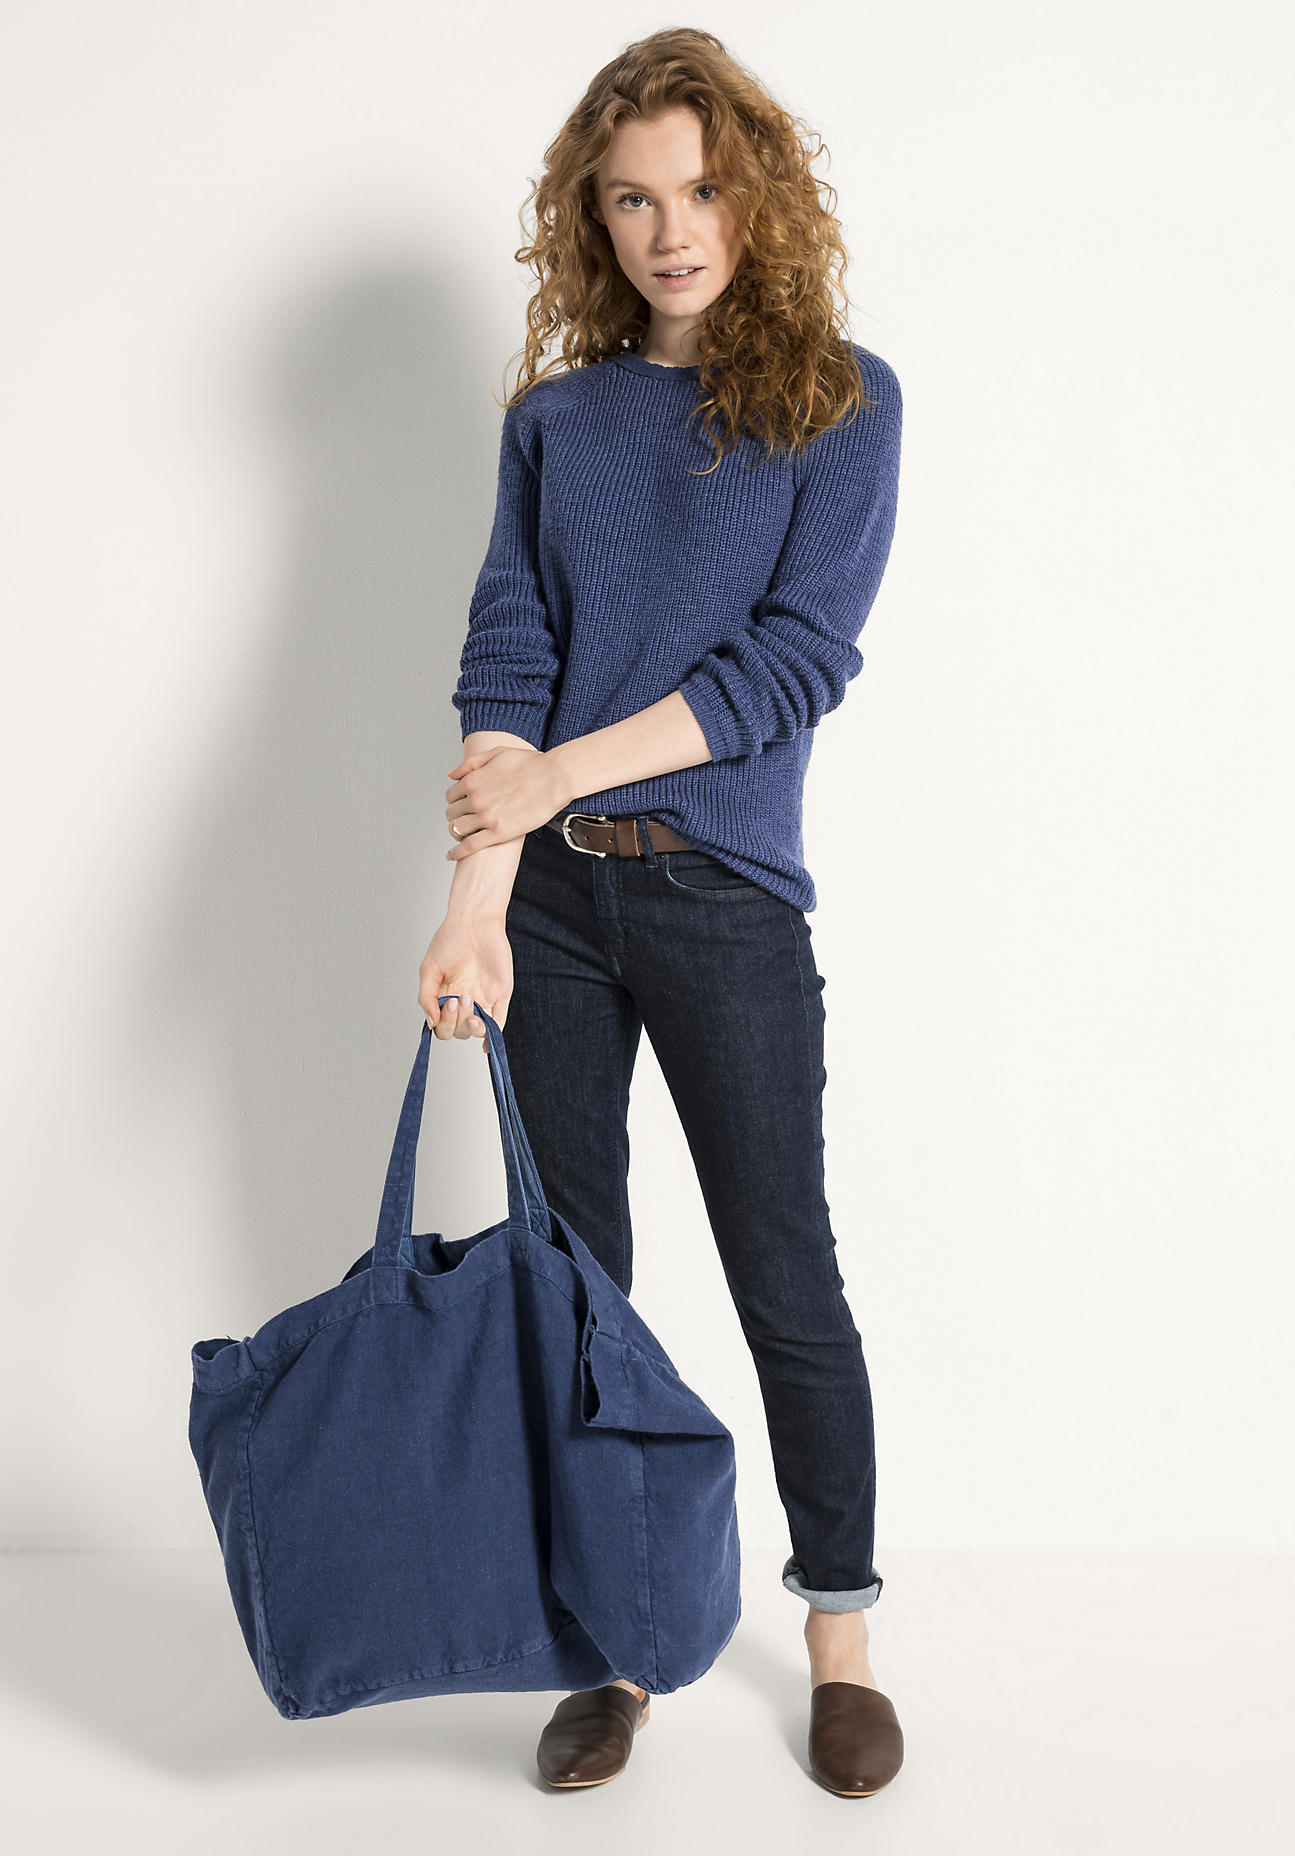 hessnatur Damen Shopper aus Hessenleinen - blau Größe 38x45 cm